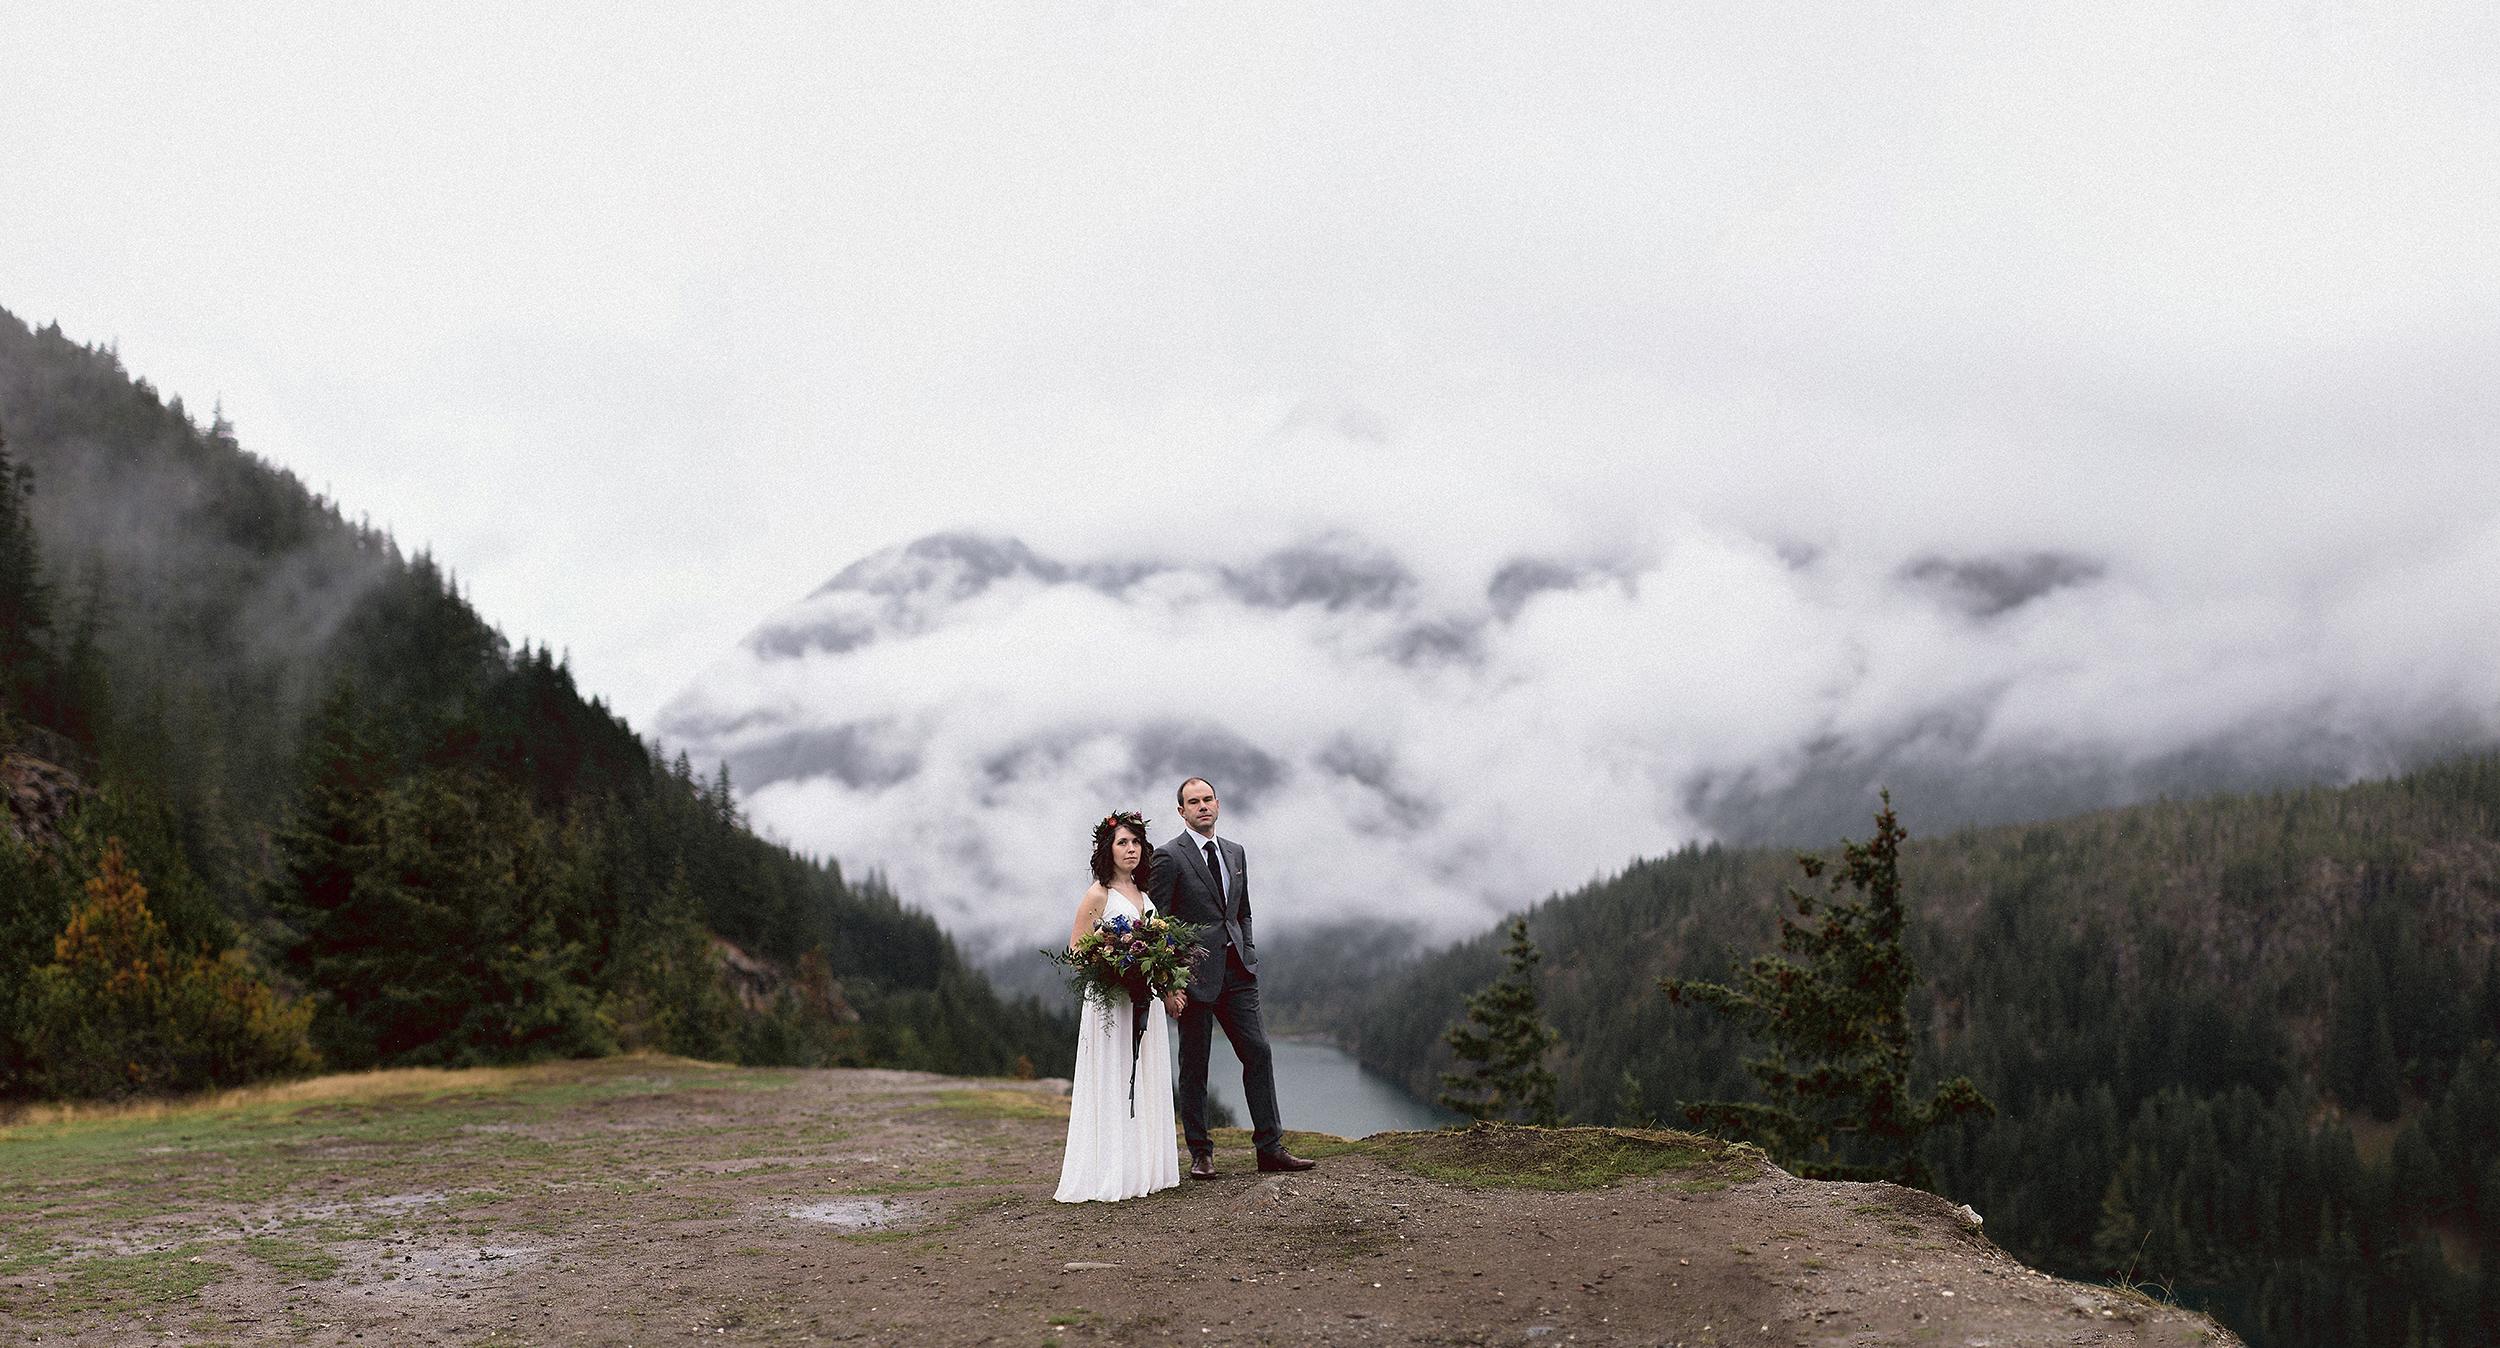 North Cascades National Park Diablo Lake Overlook